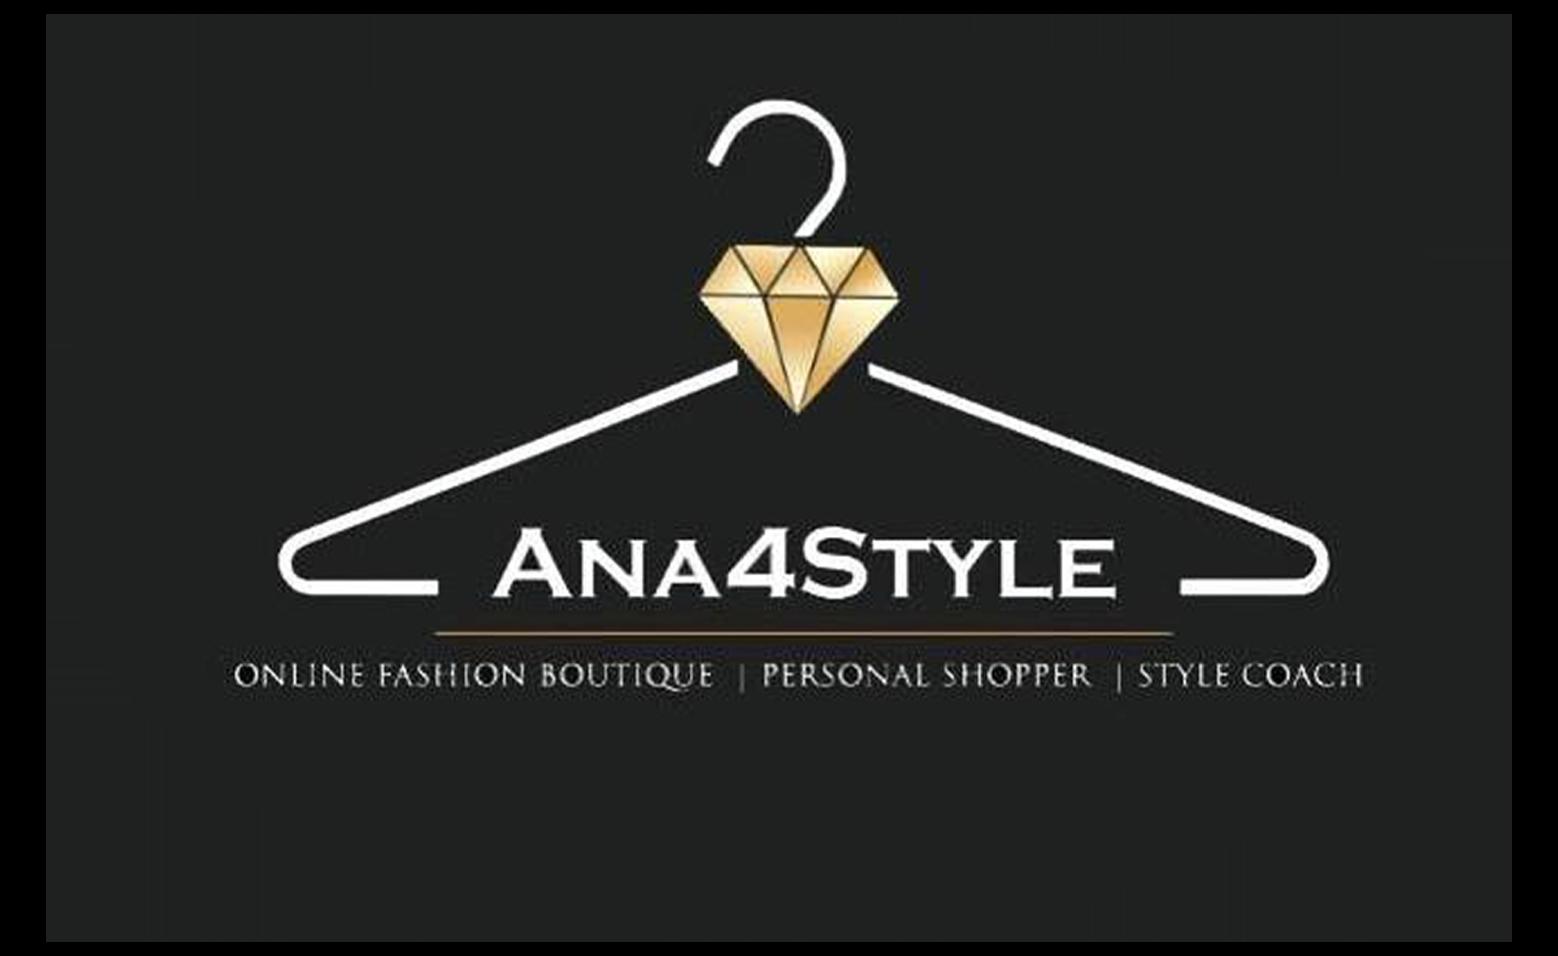 ana4style